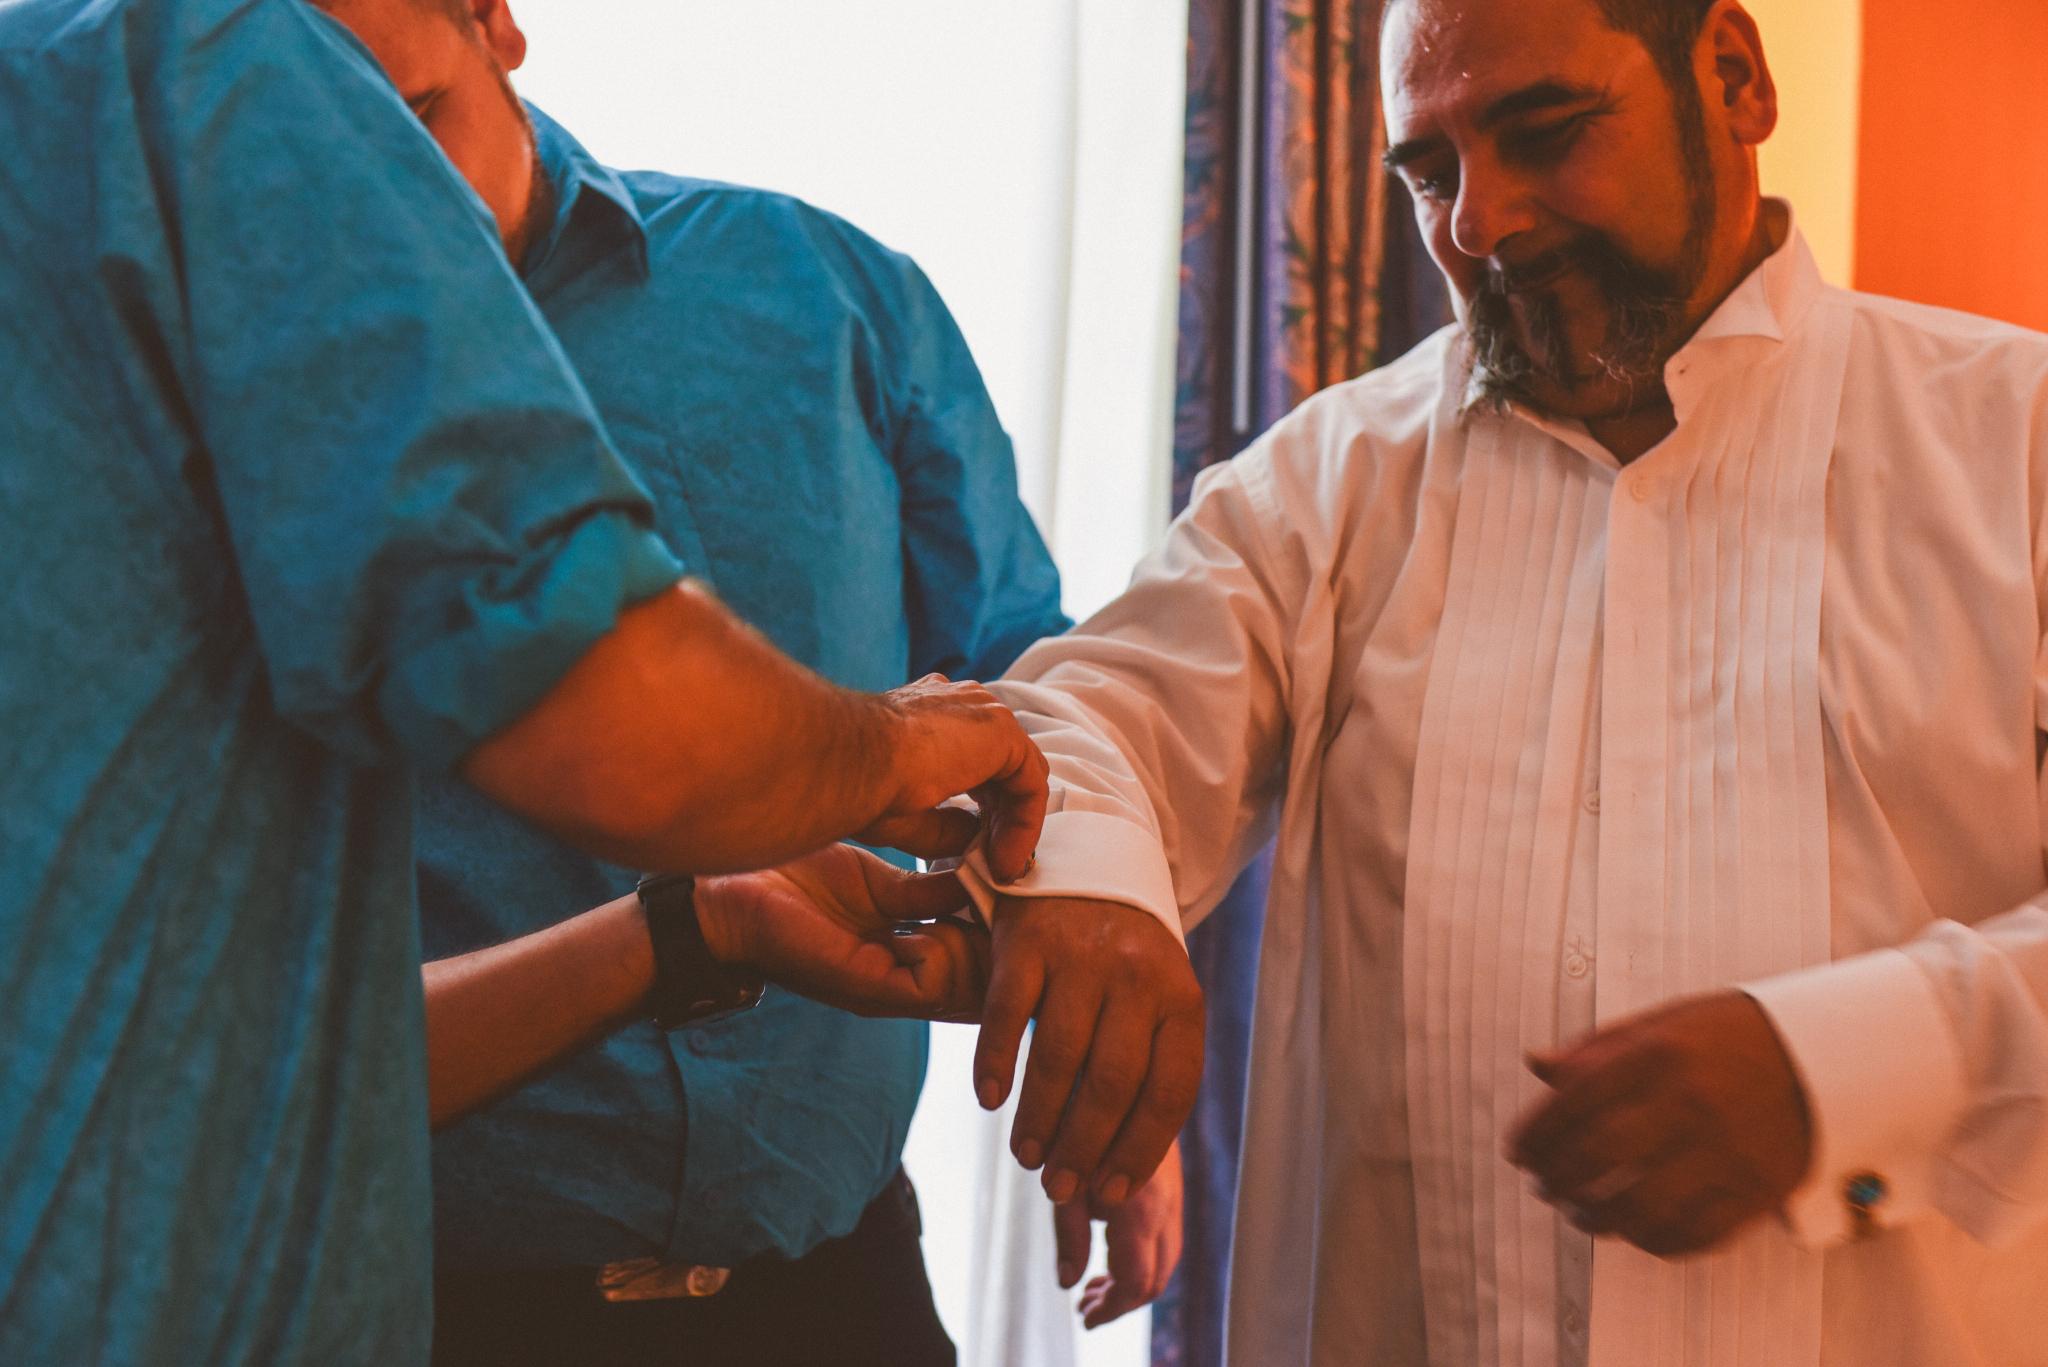 san diego wedding   photographer   men in turquoise shirts helping man fix shirt